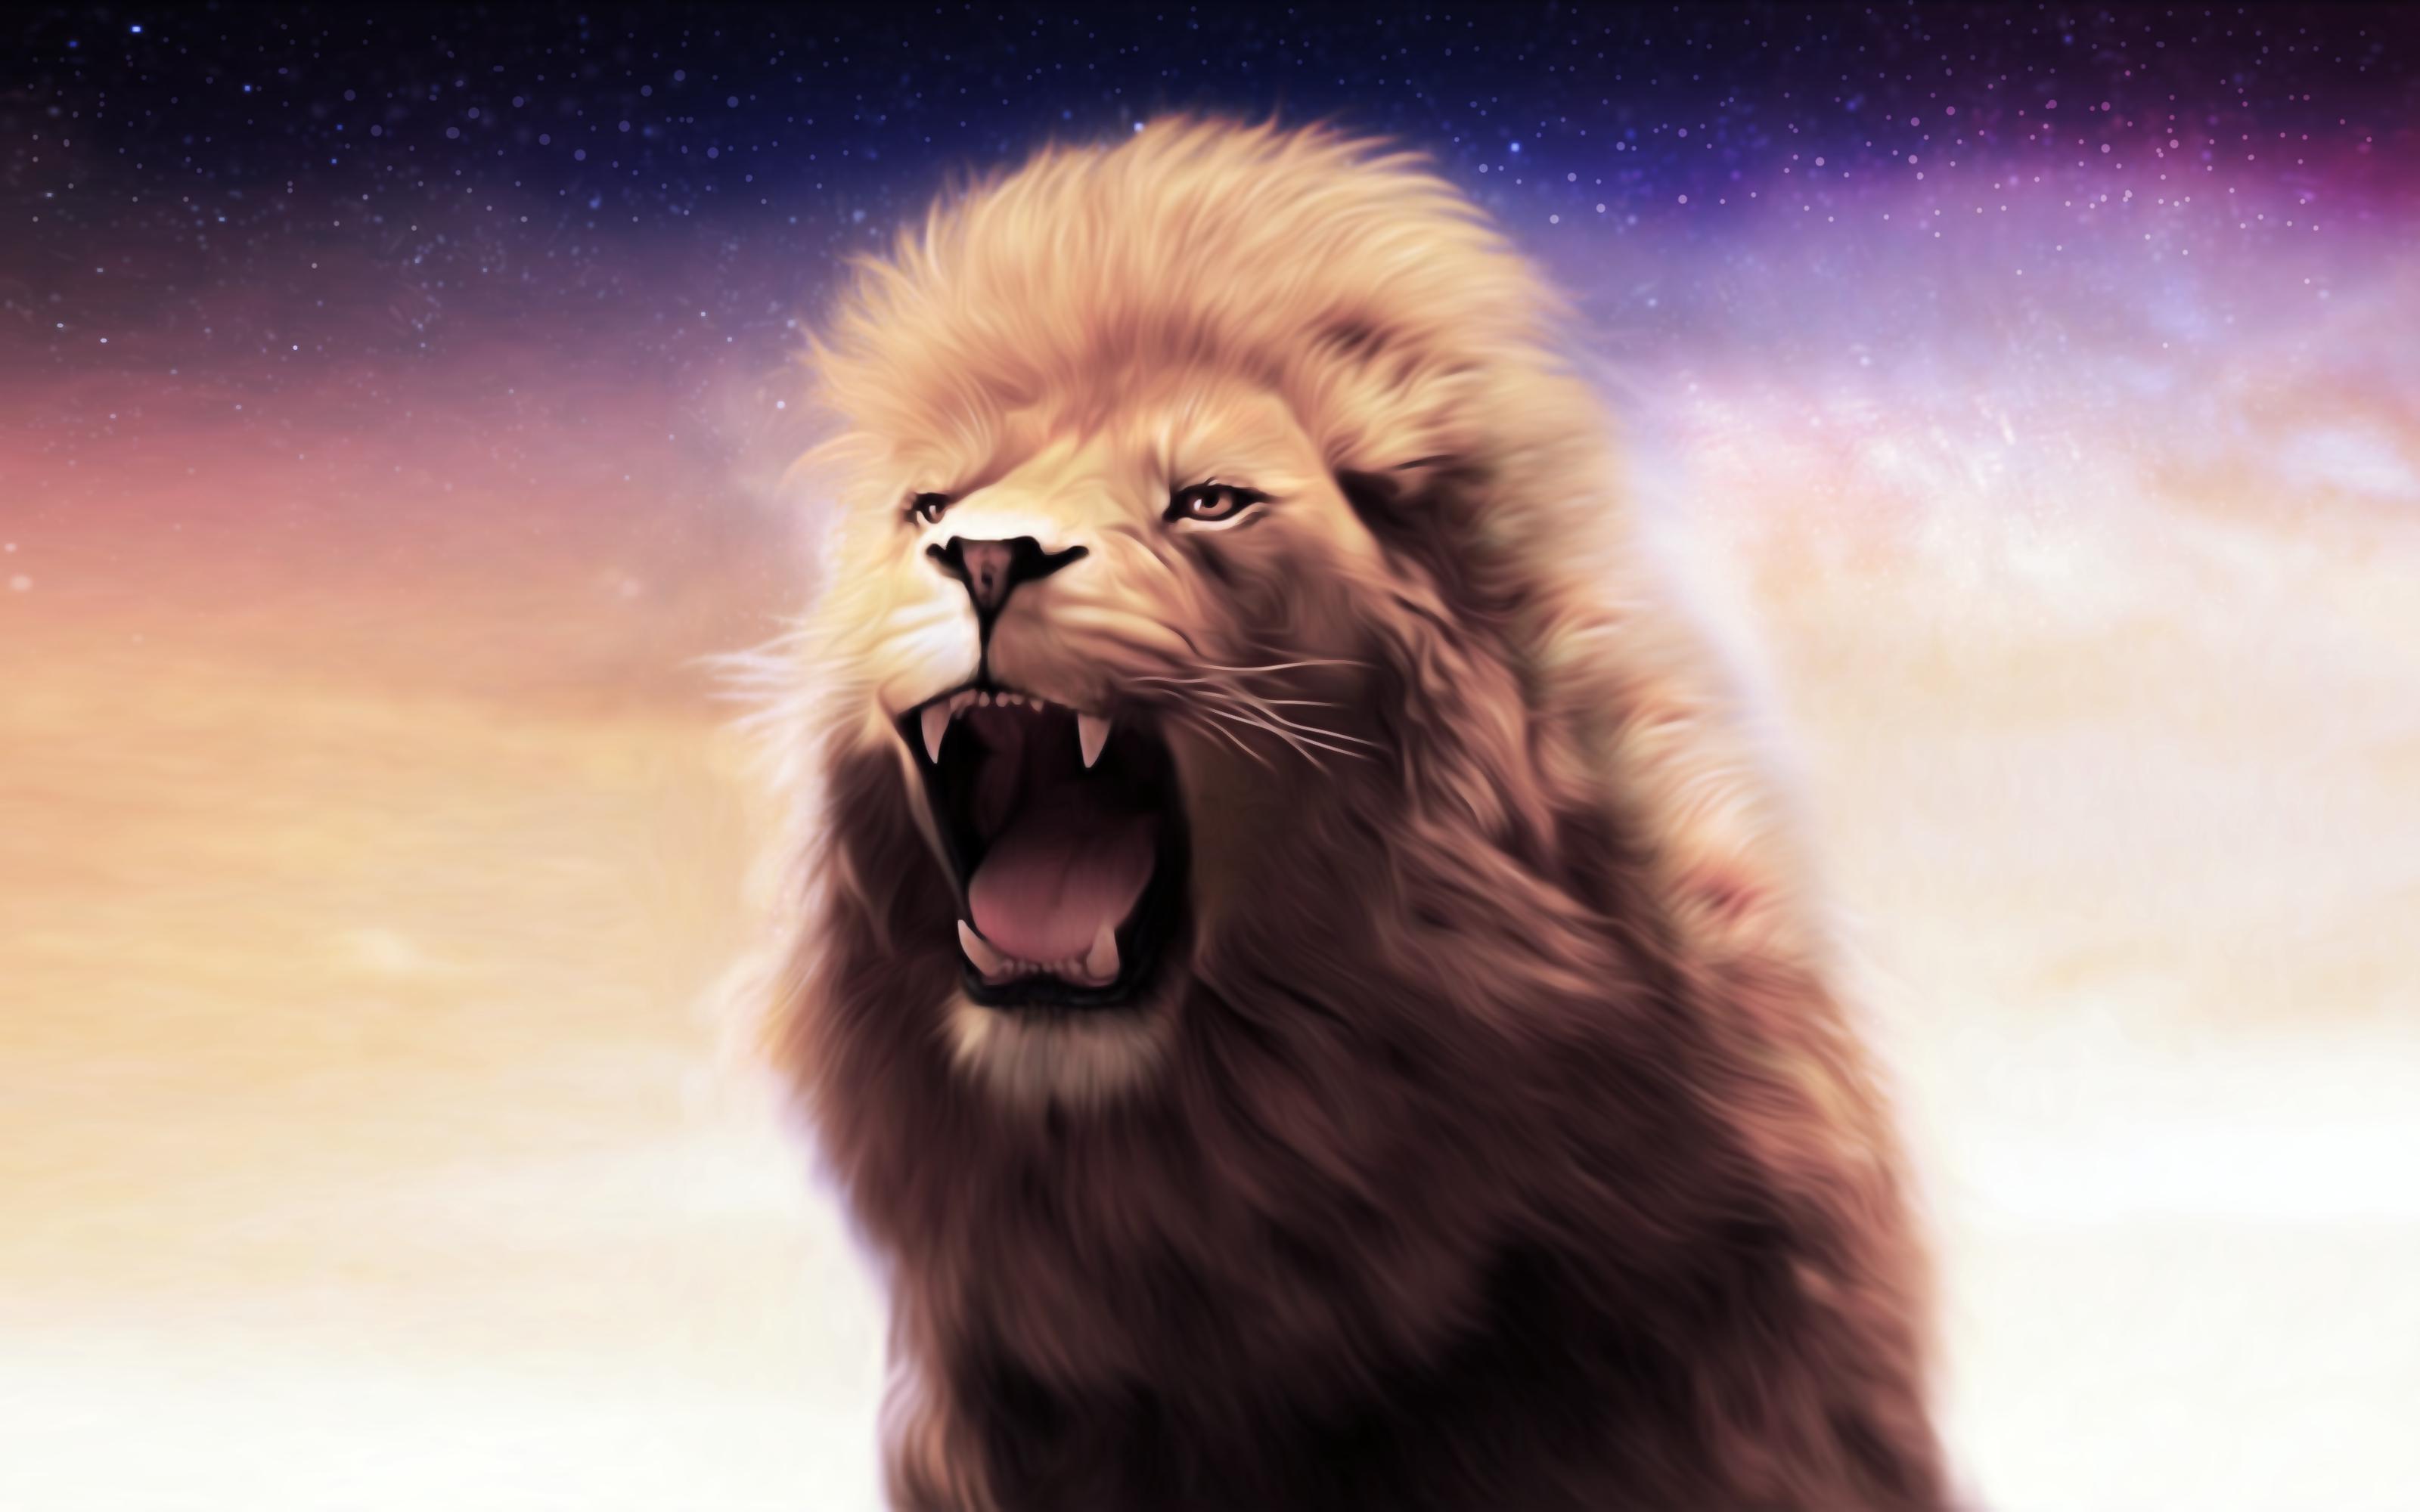 Wallpaper Lion Roar Hd Wallpaper: Lion Roar Wallpaper